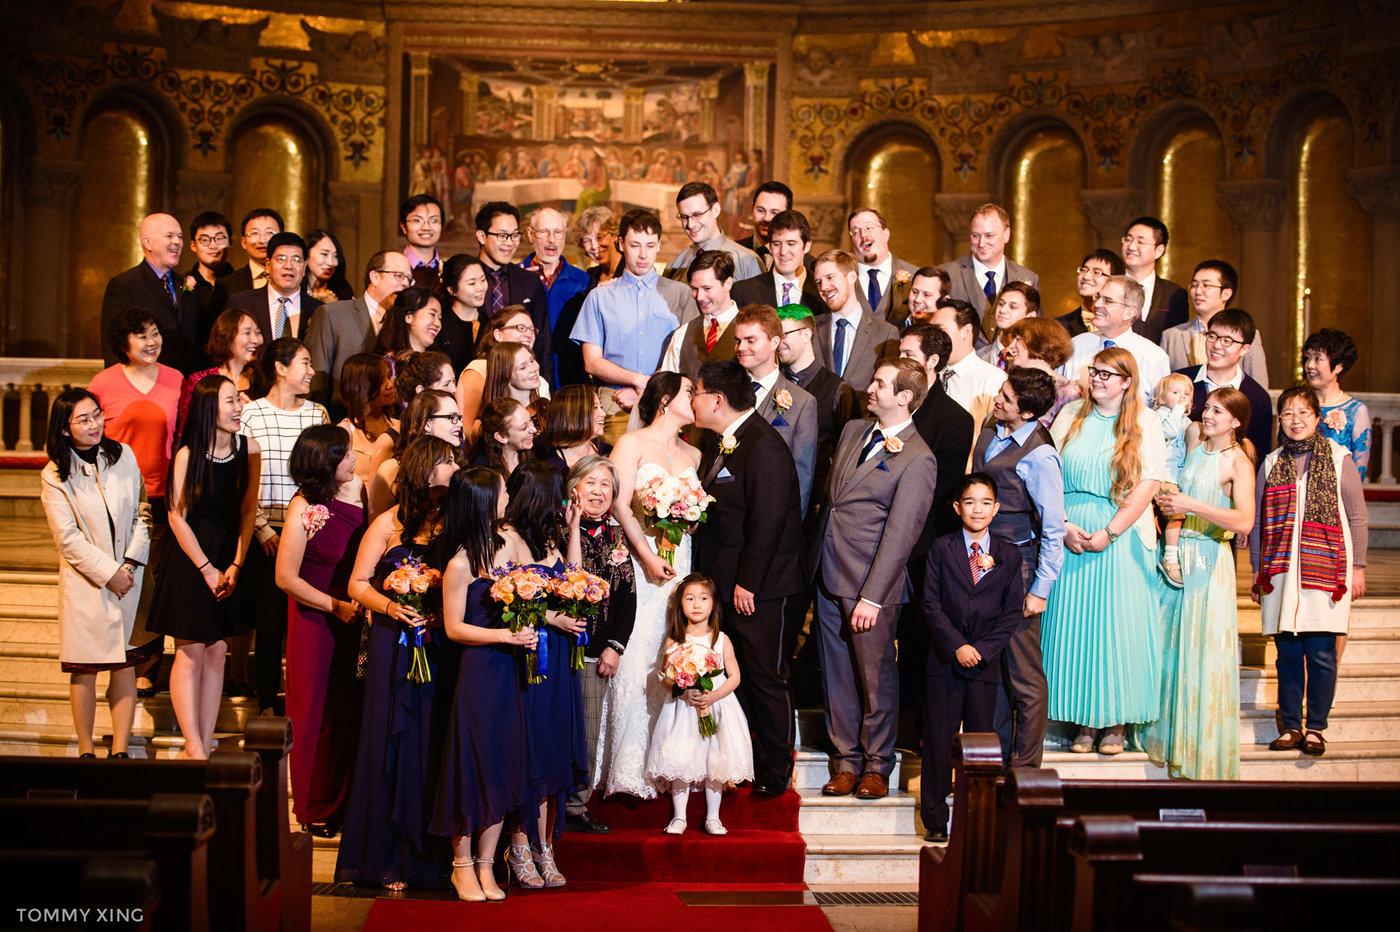 STANFORD MEMORIAL CHURCH WEDDING - Wenjie & Chengcheng - SAN FRANCISCO BAY AREA 斯坦福教堂婚礼跟拍 - 洛杉矶婚礼婚纱照摄影师 Tommy Xing Photography137.jpg